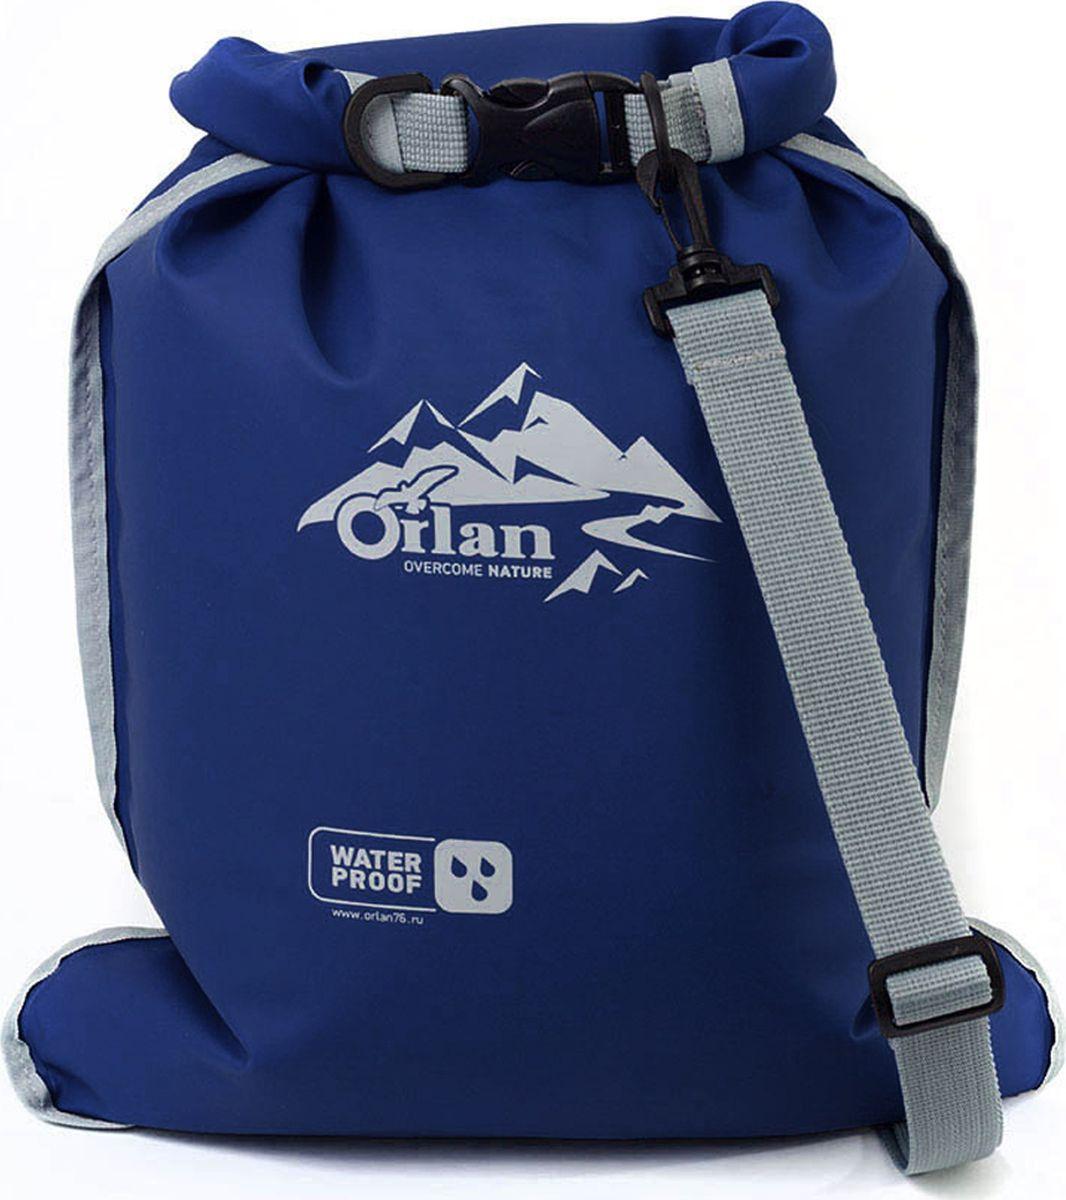 Гермомешок Orlan Компакт, цвет: синий, 5л гермомешок orlan компакт цвет темно синий 10 л